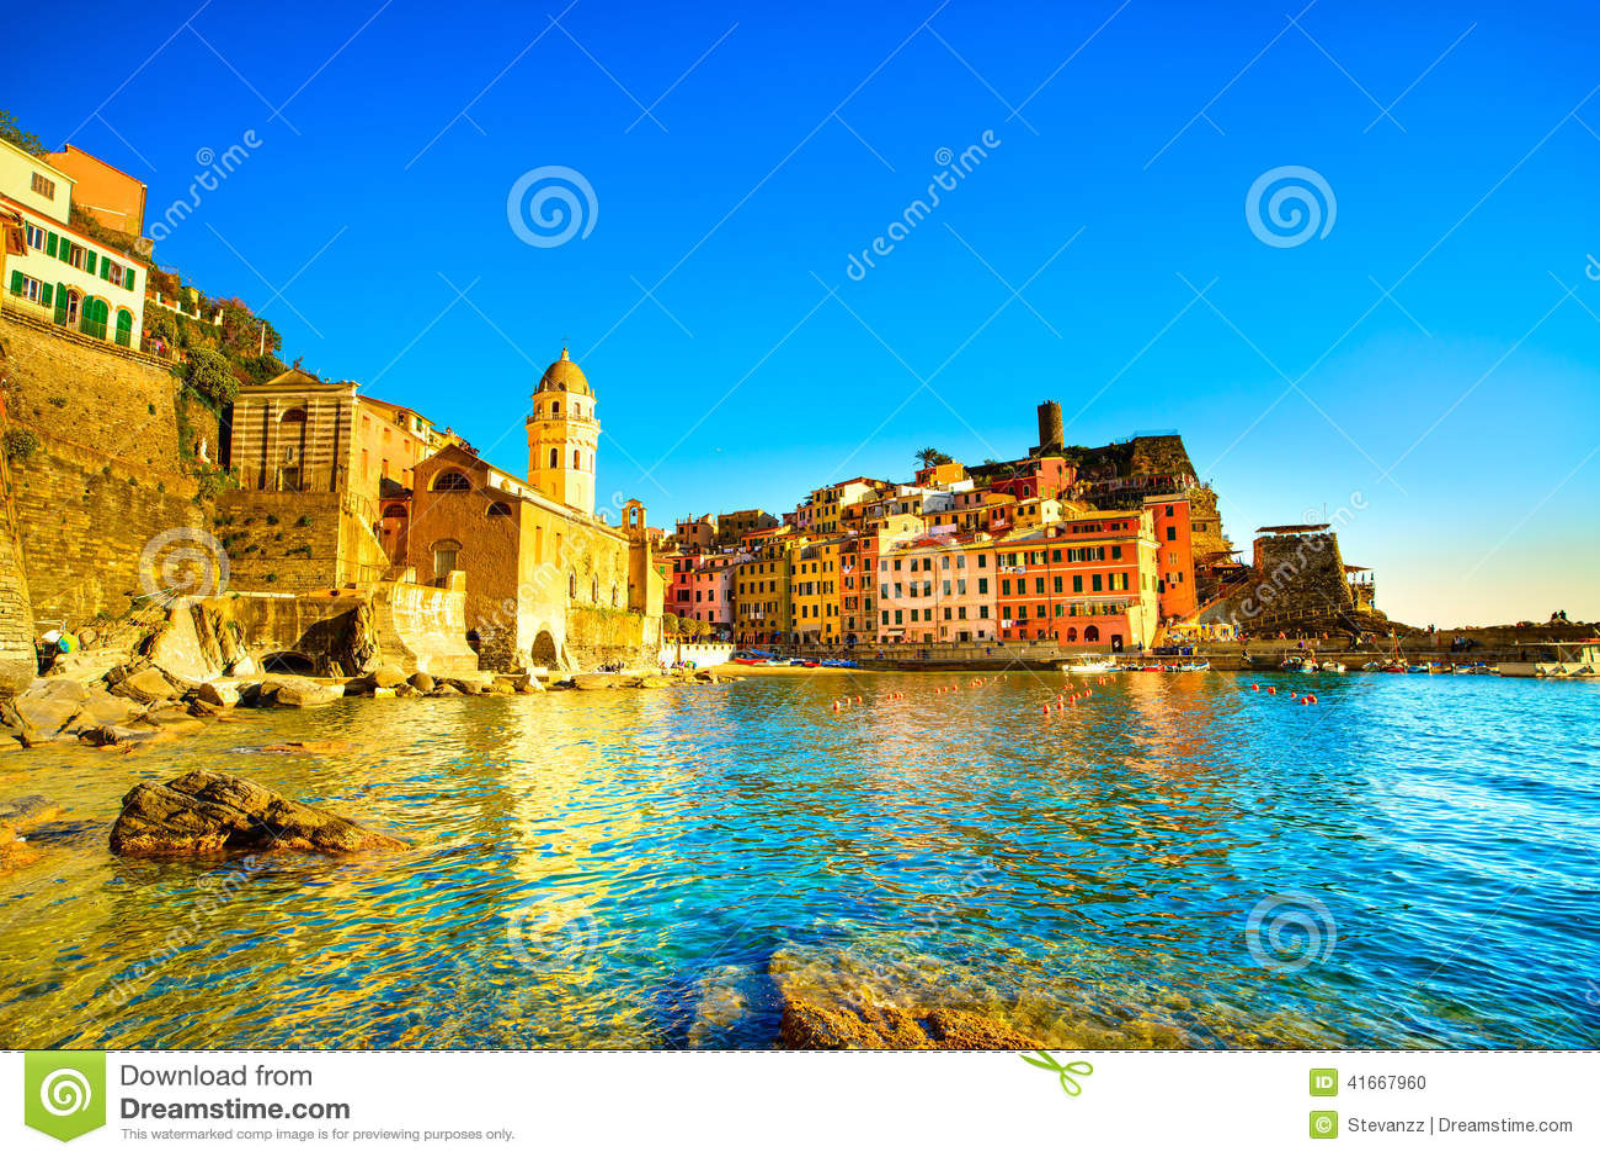 Vernazza village, church, rocks and sea harbor on sunset. Cinque